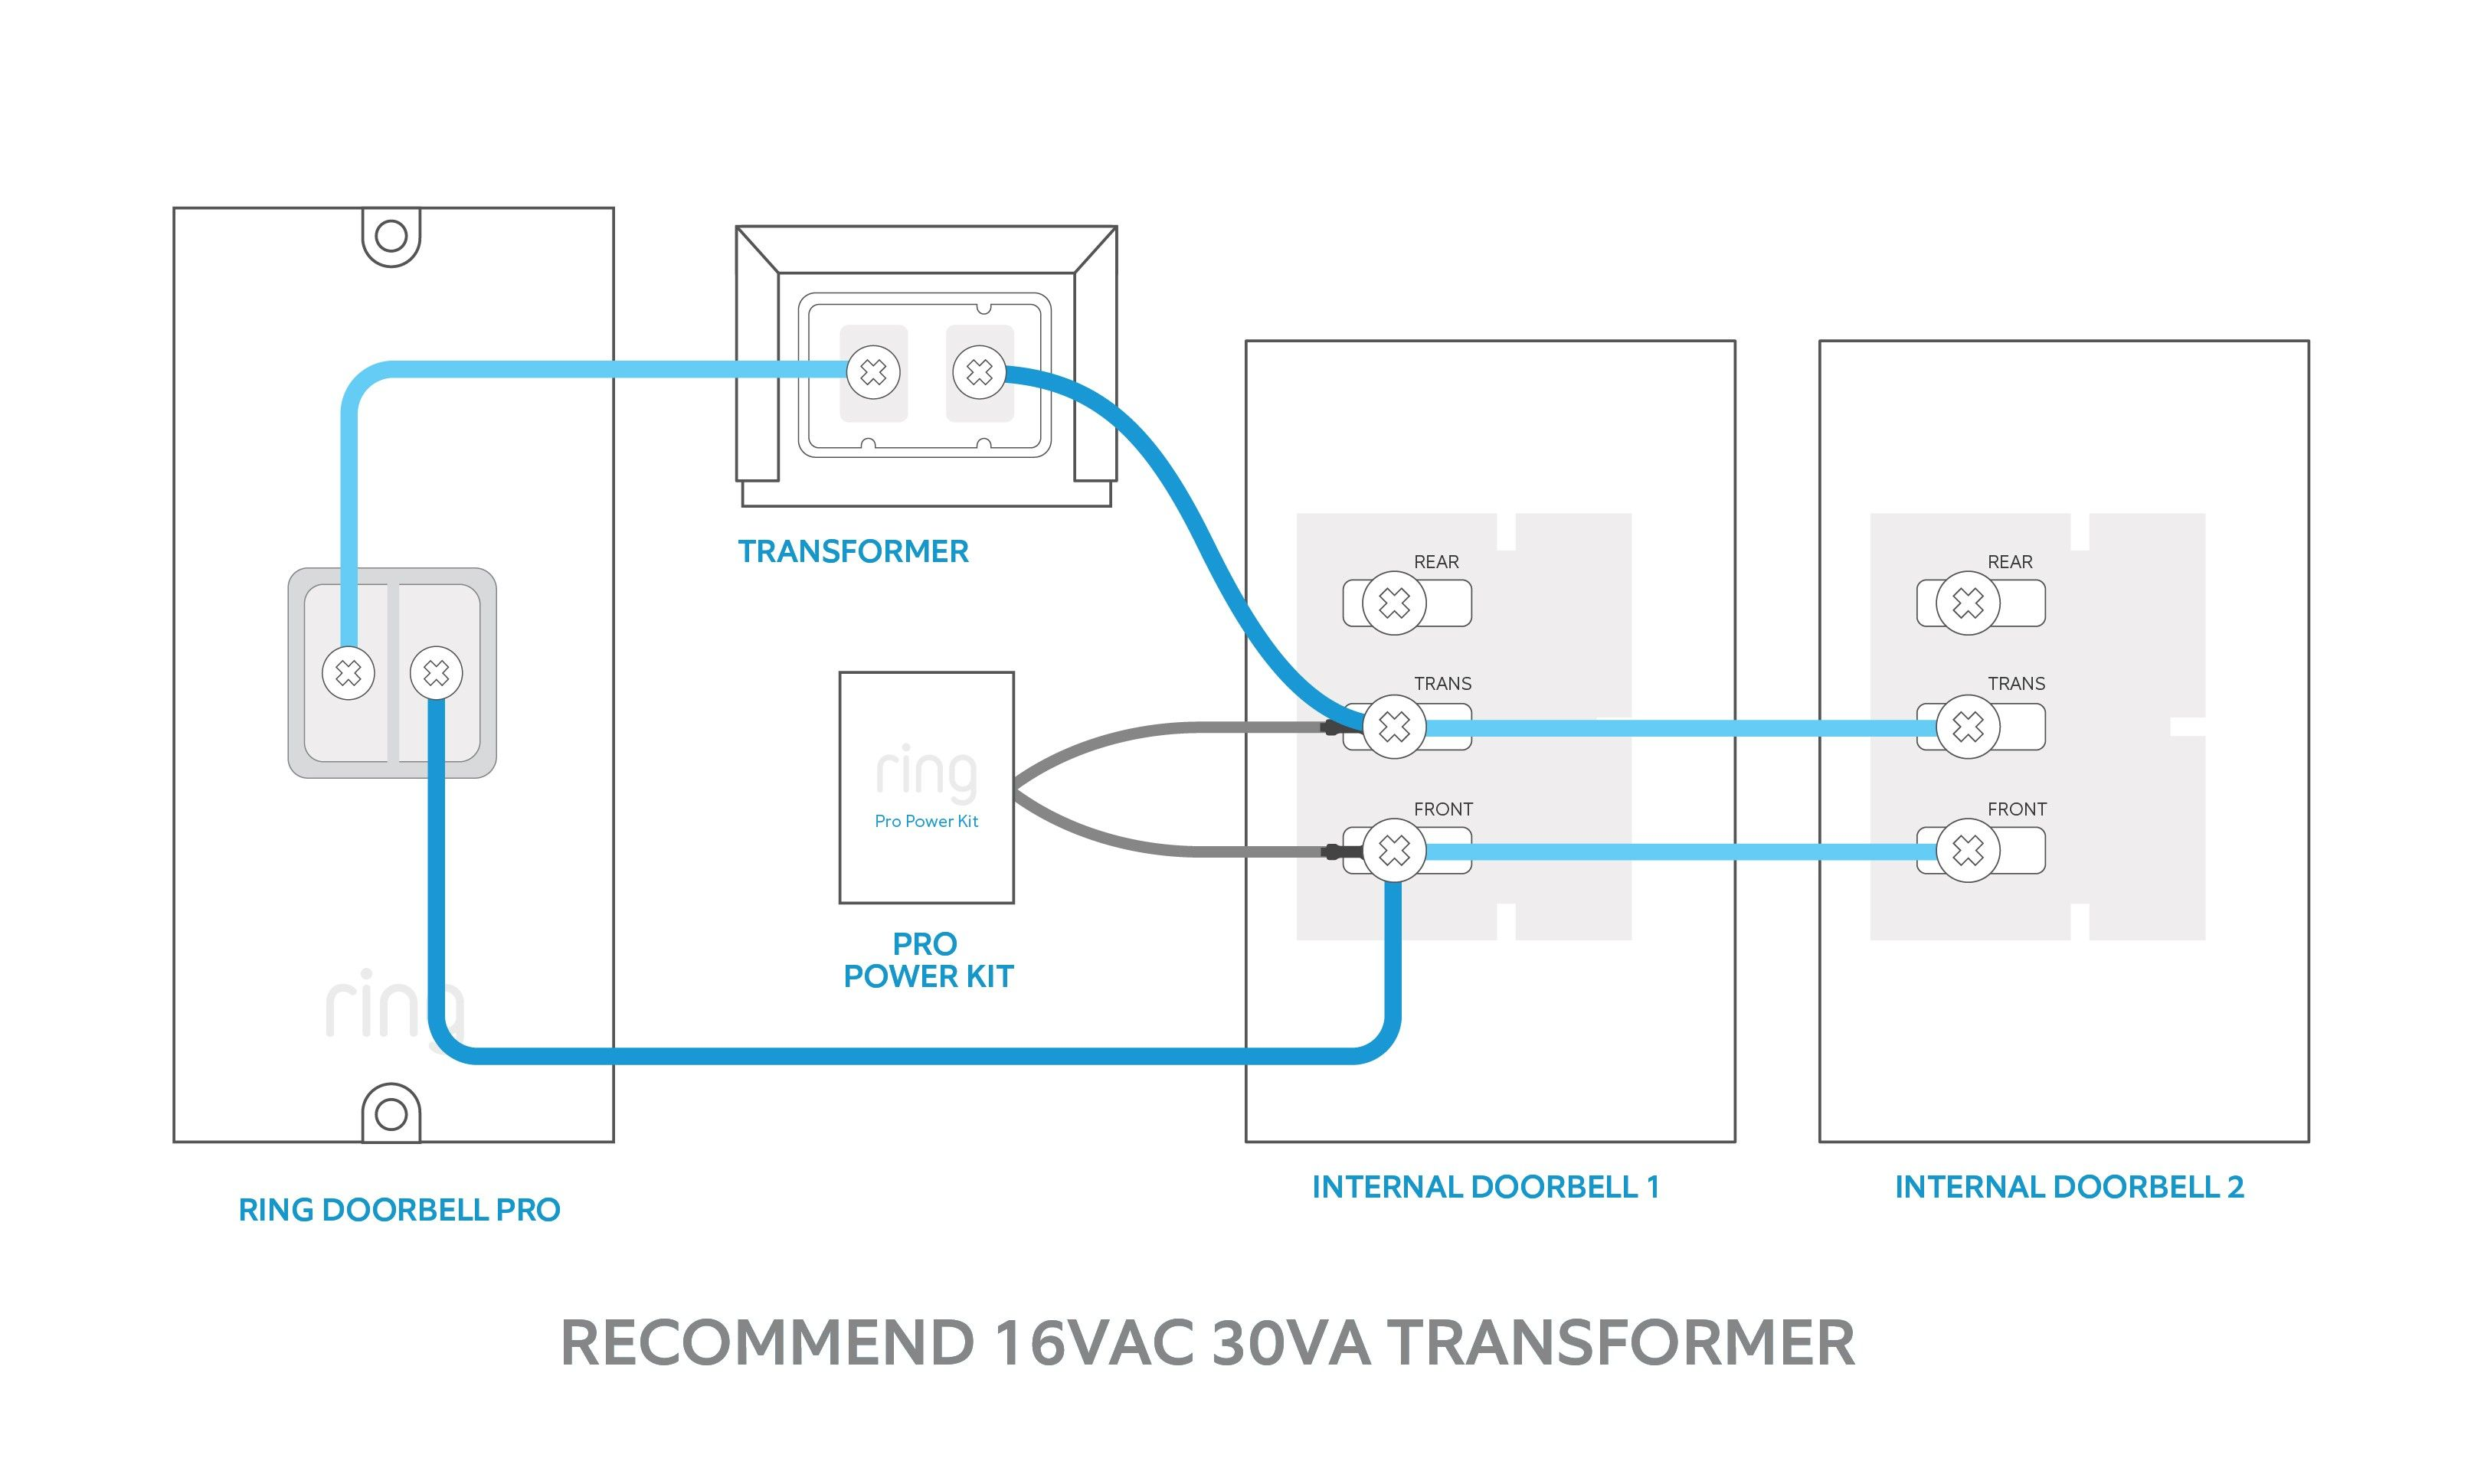 New Doorbell Wiring Diagram Tutorial Diagram Diagramsample Diagramtemplate Wiringdiagram Diagramchart Worksheet Worksh Auto Transformer Diagram Doorbell